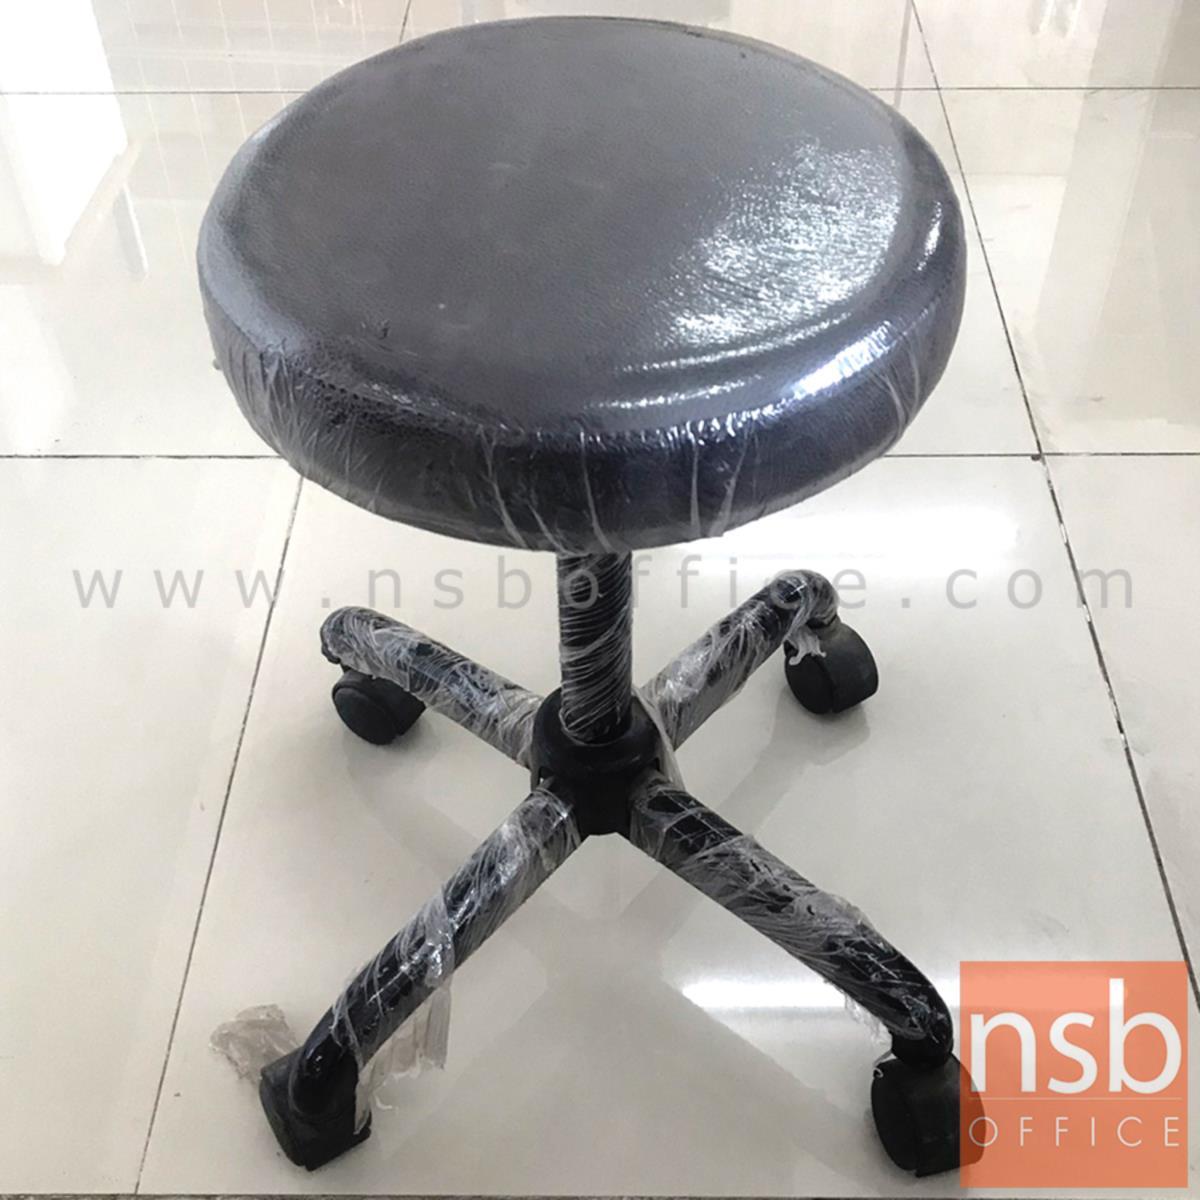 L02A340:เก้าอี้บาร์เตี้ย  ขนาด 30Di*50H cm. ขาดำ (STOCK-1 ตัว)